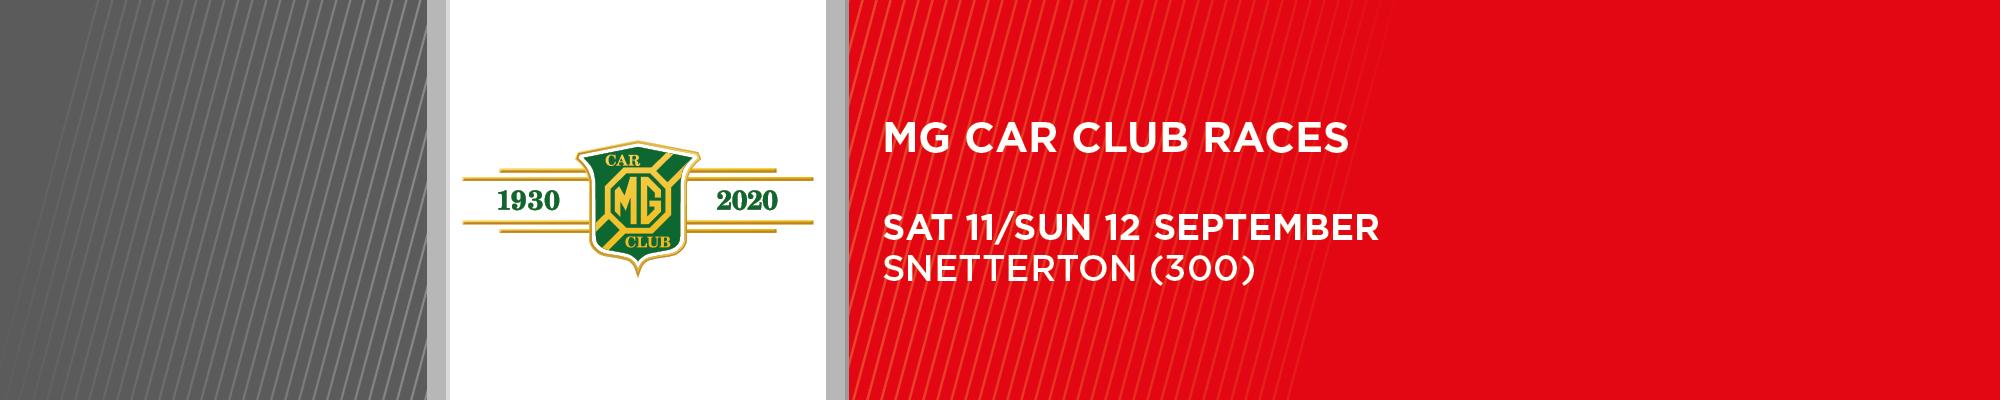 MG Car Club Championships